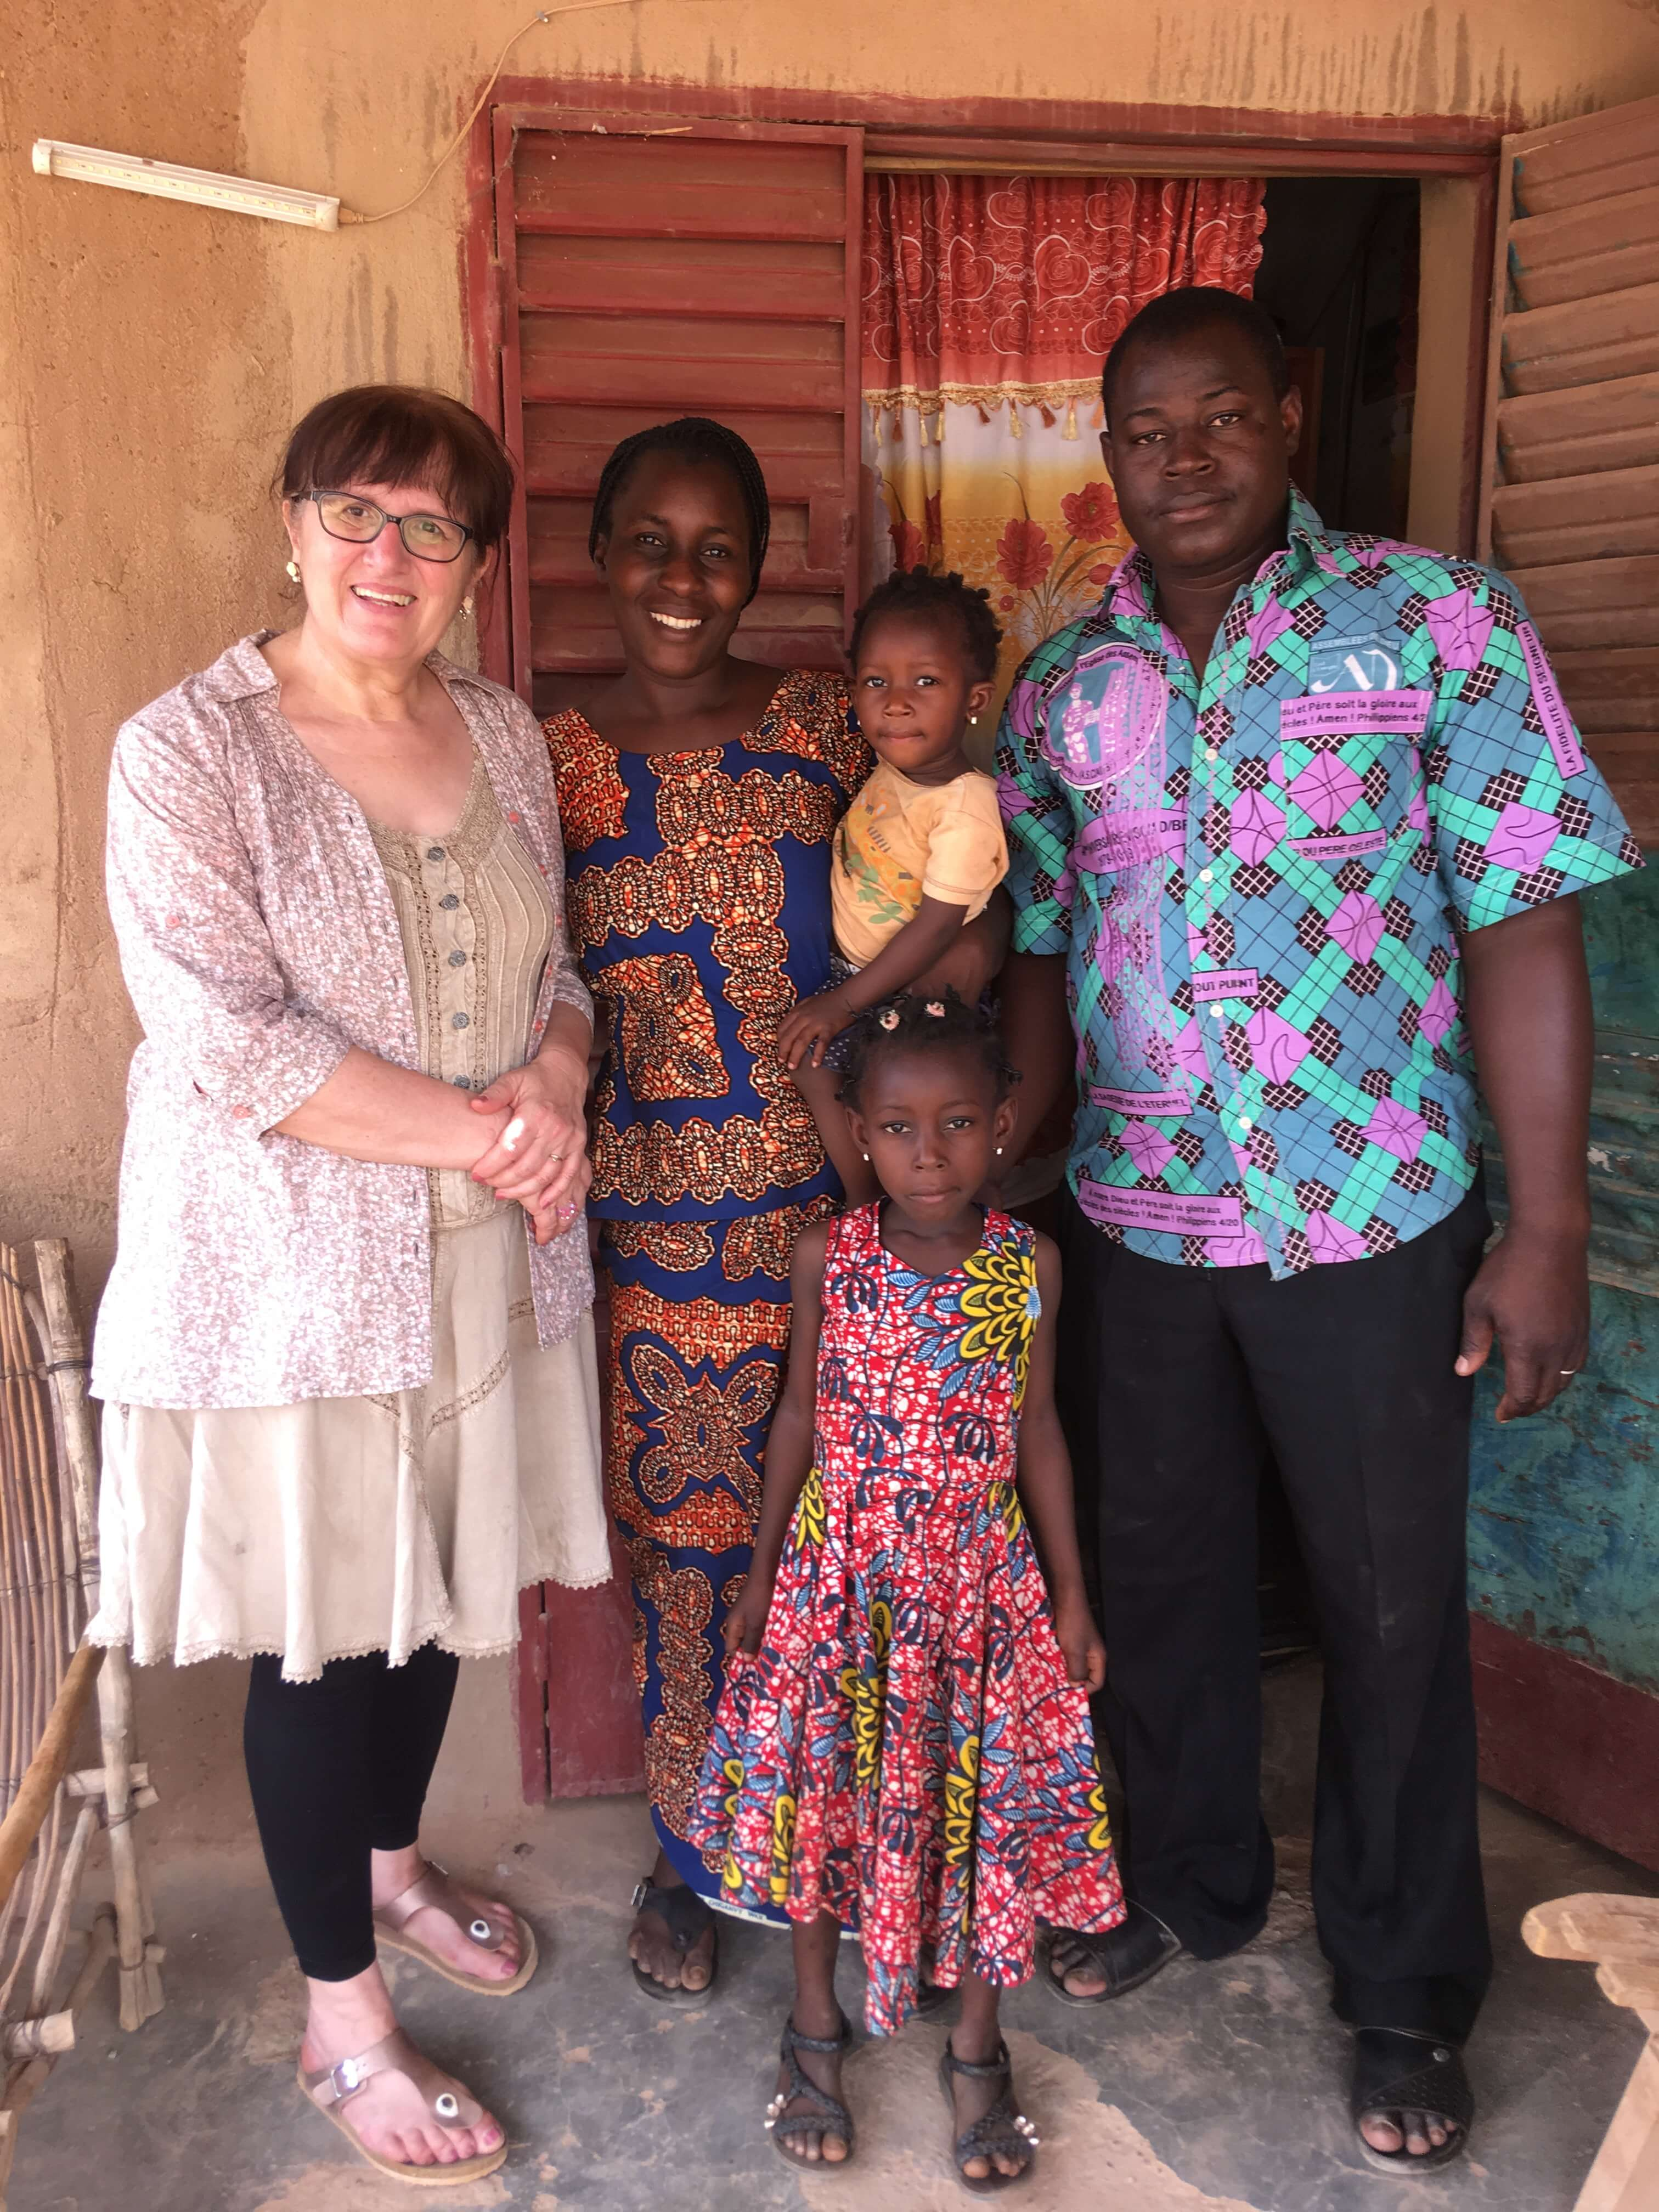 Cathy et la famille du pasteur Barkwende